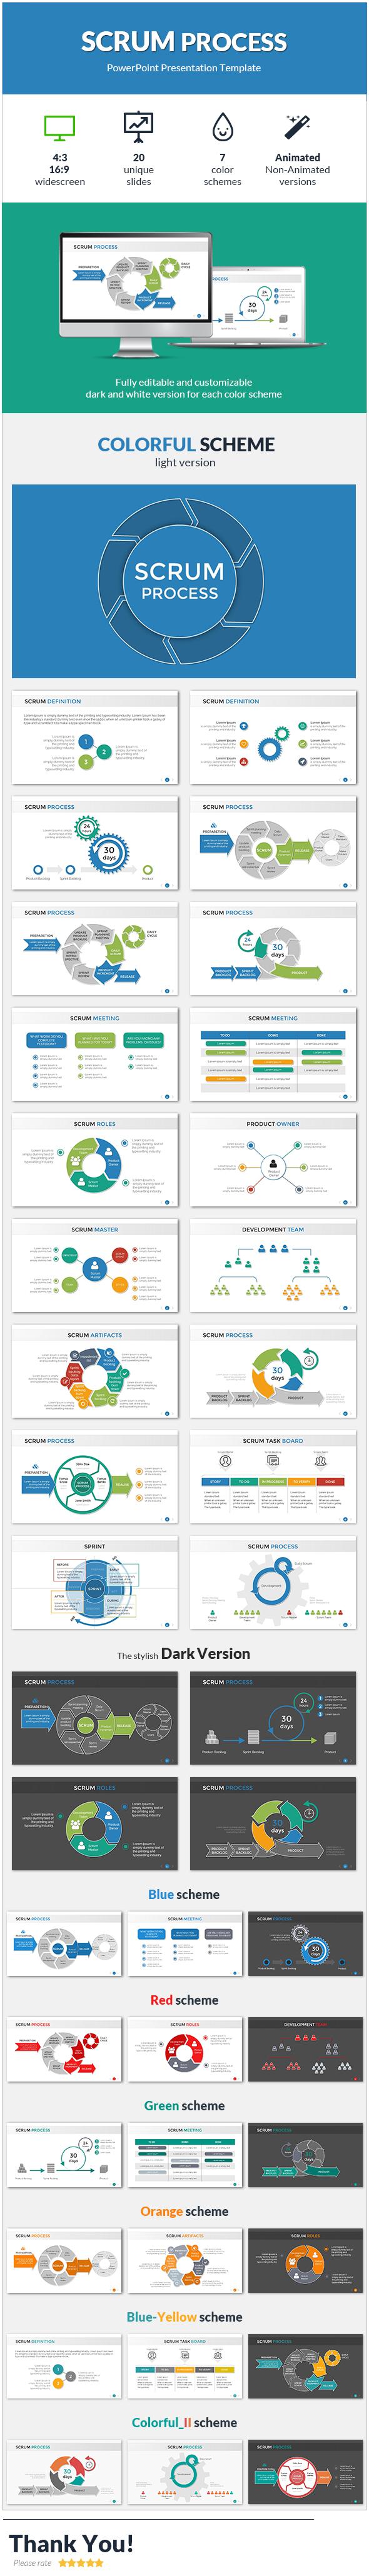 scrum process powerpoint presentation templatesananik, Modern powerpoint